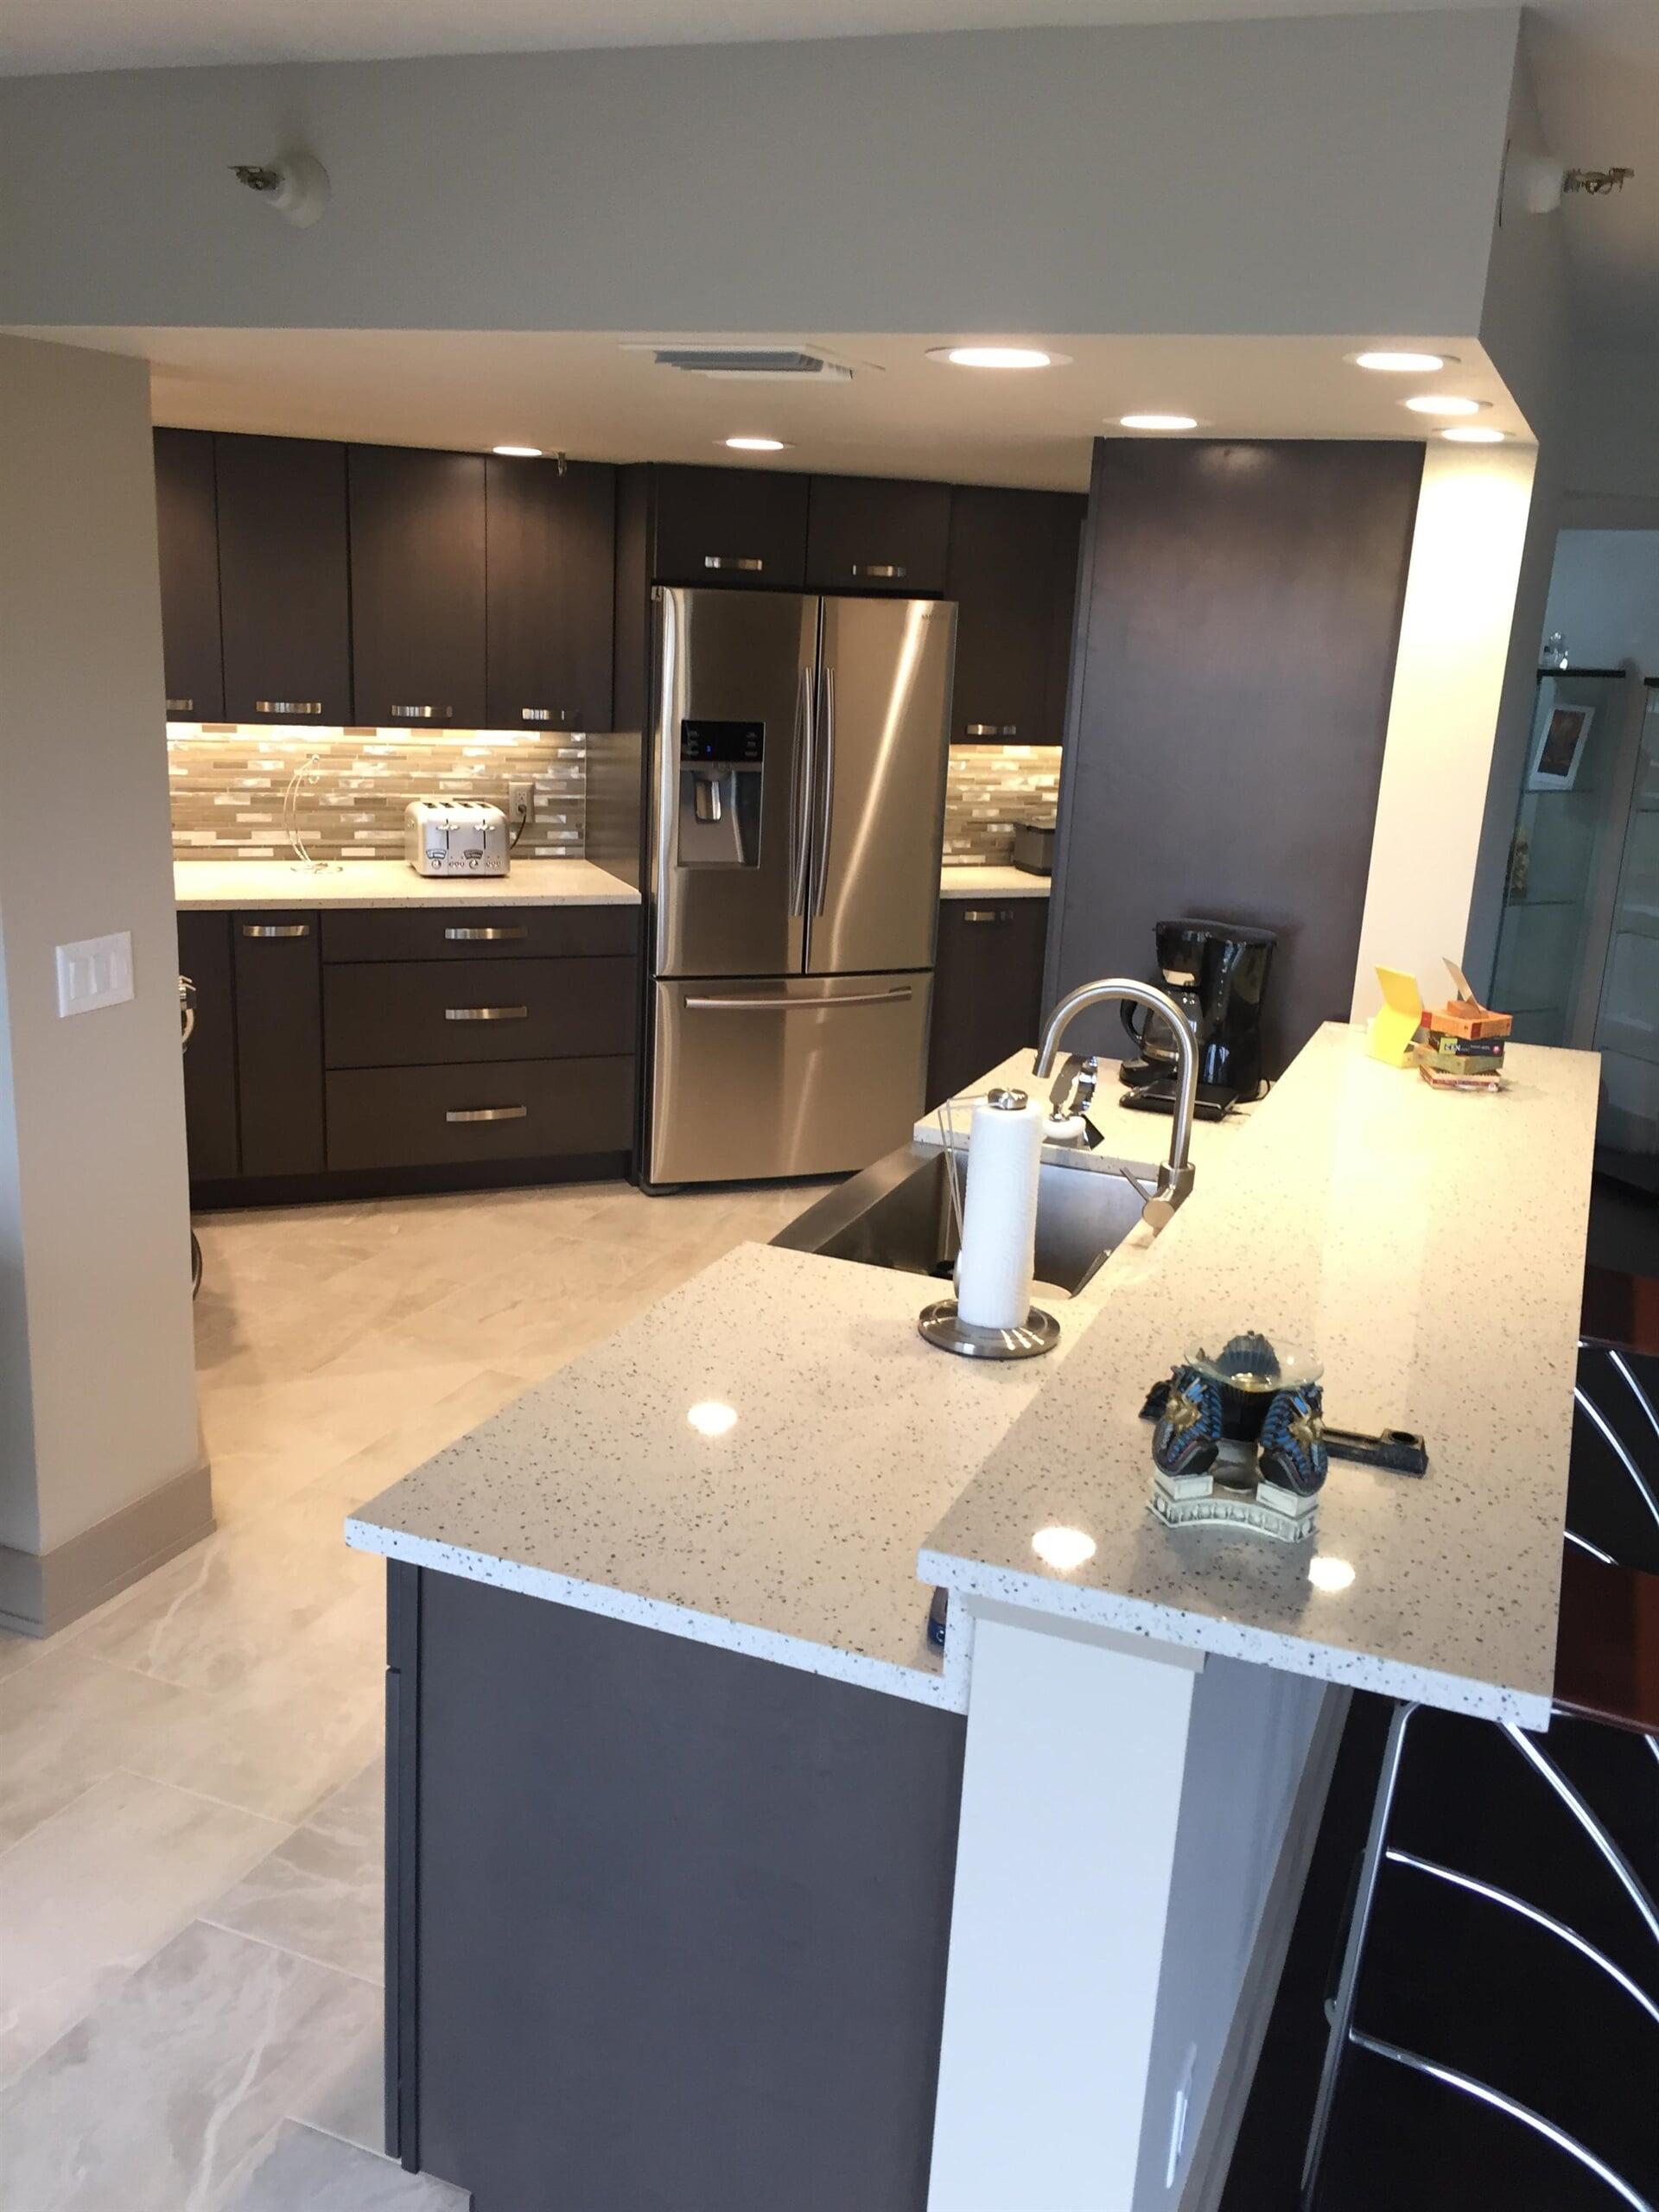 Beautiful kitchen design in Palm Harbor, FL from Floor Depot